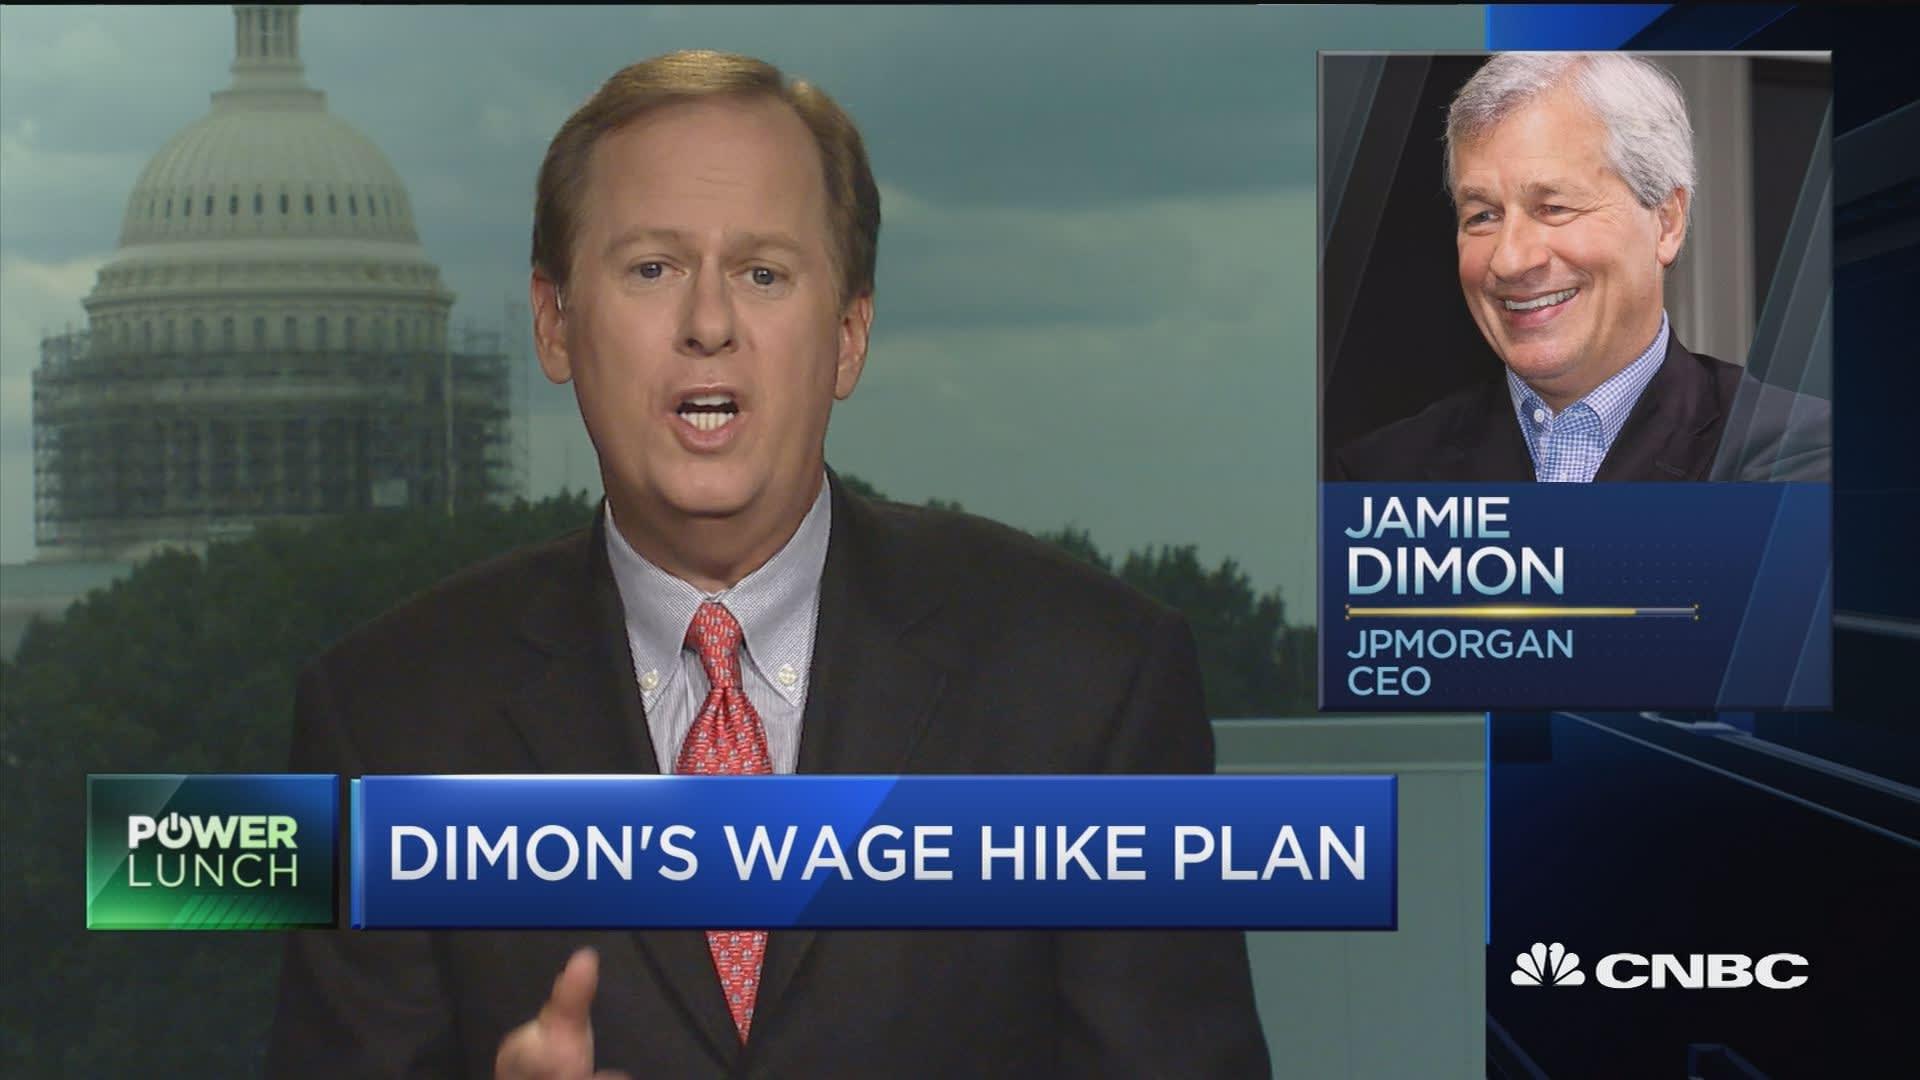 Dimon's wage hike plan